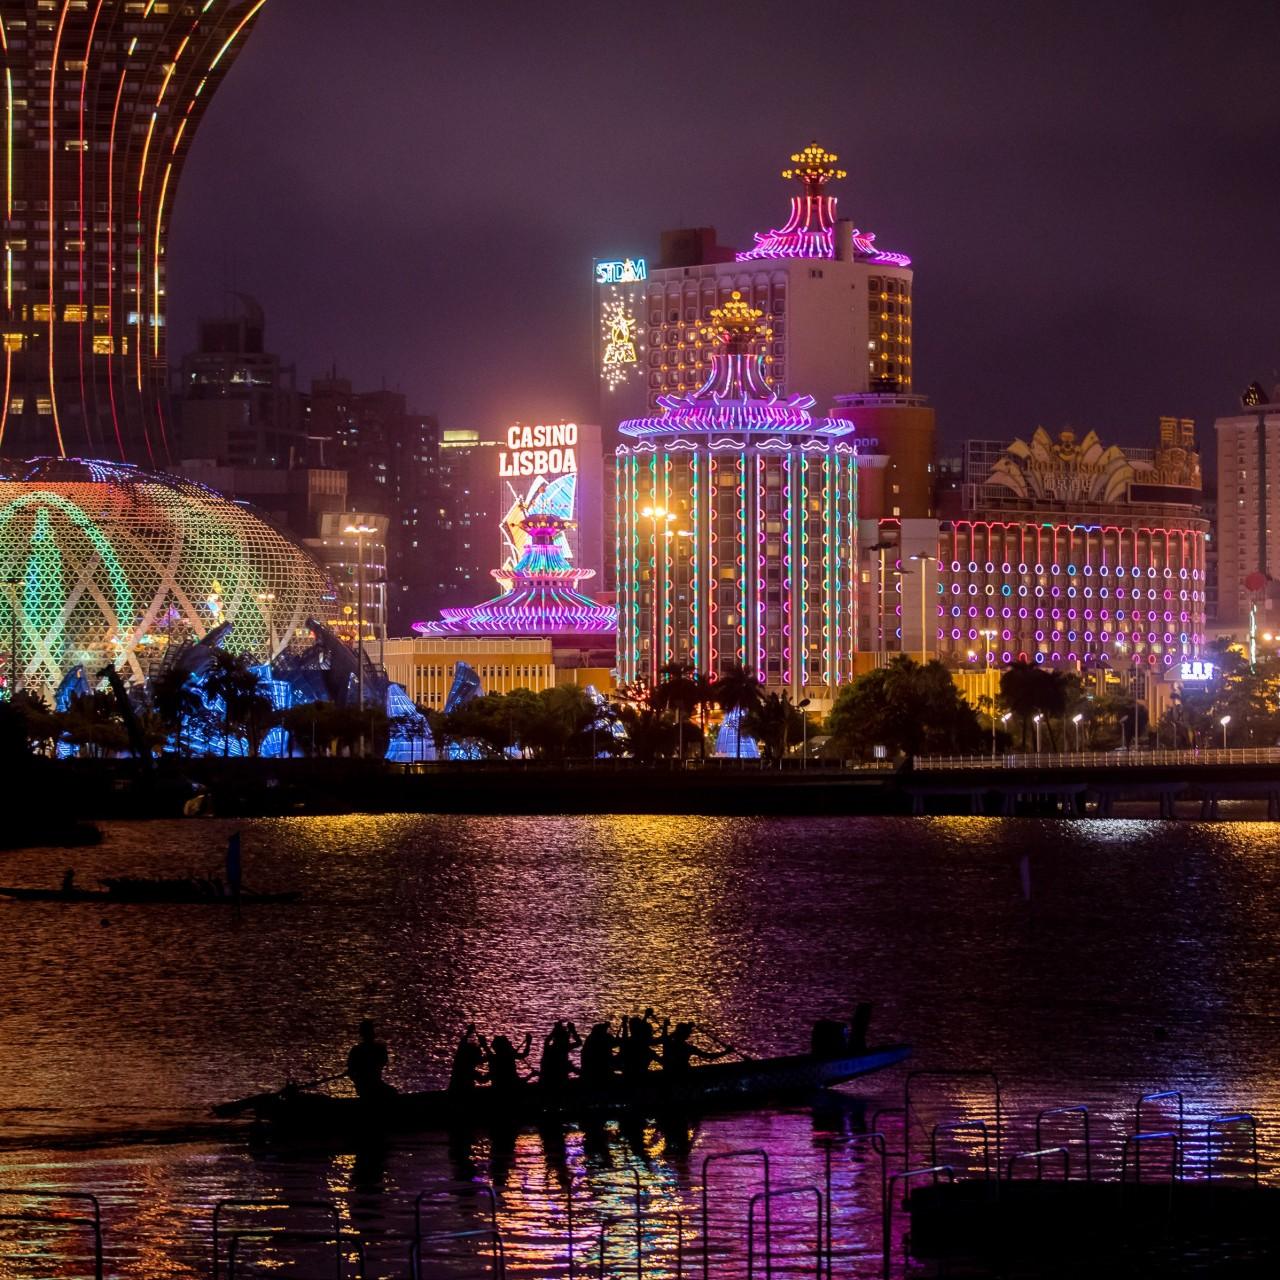 SJM shareholders approve casino mogul Stanley Ho's retirement as he